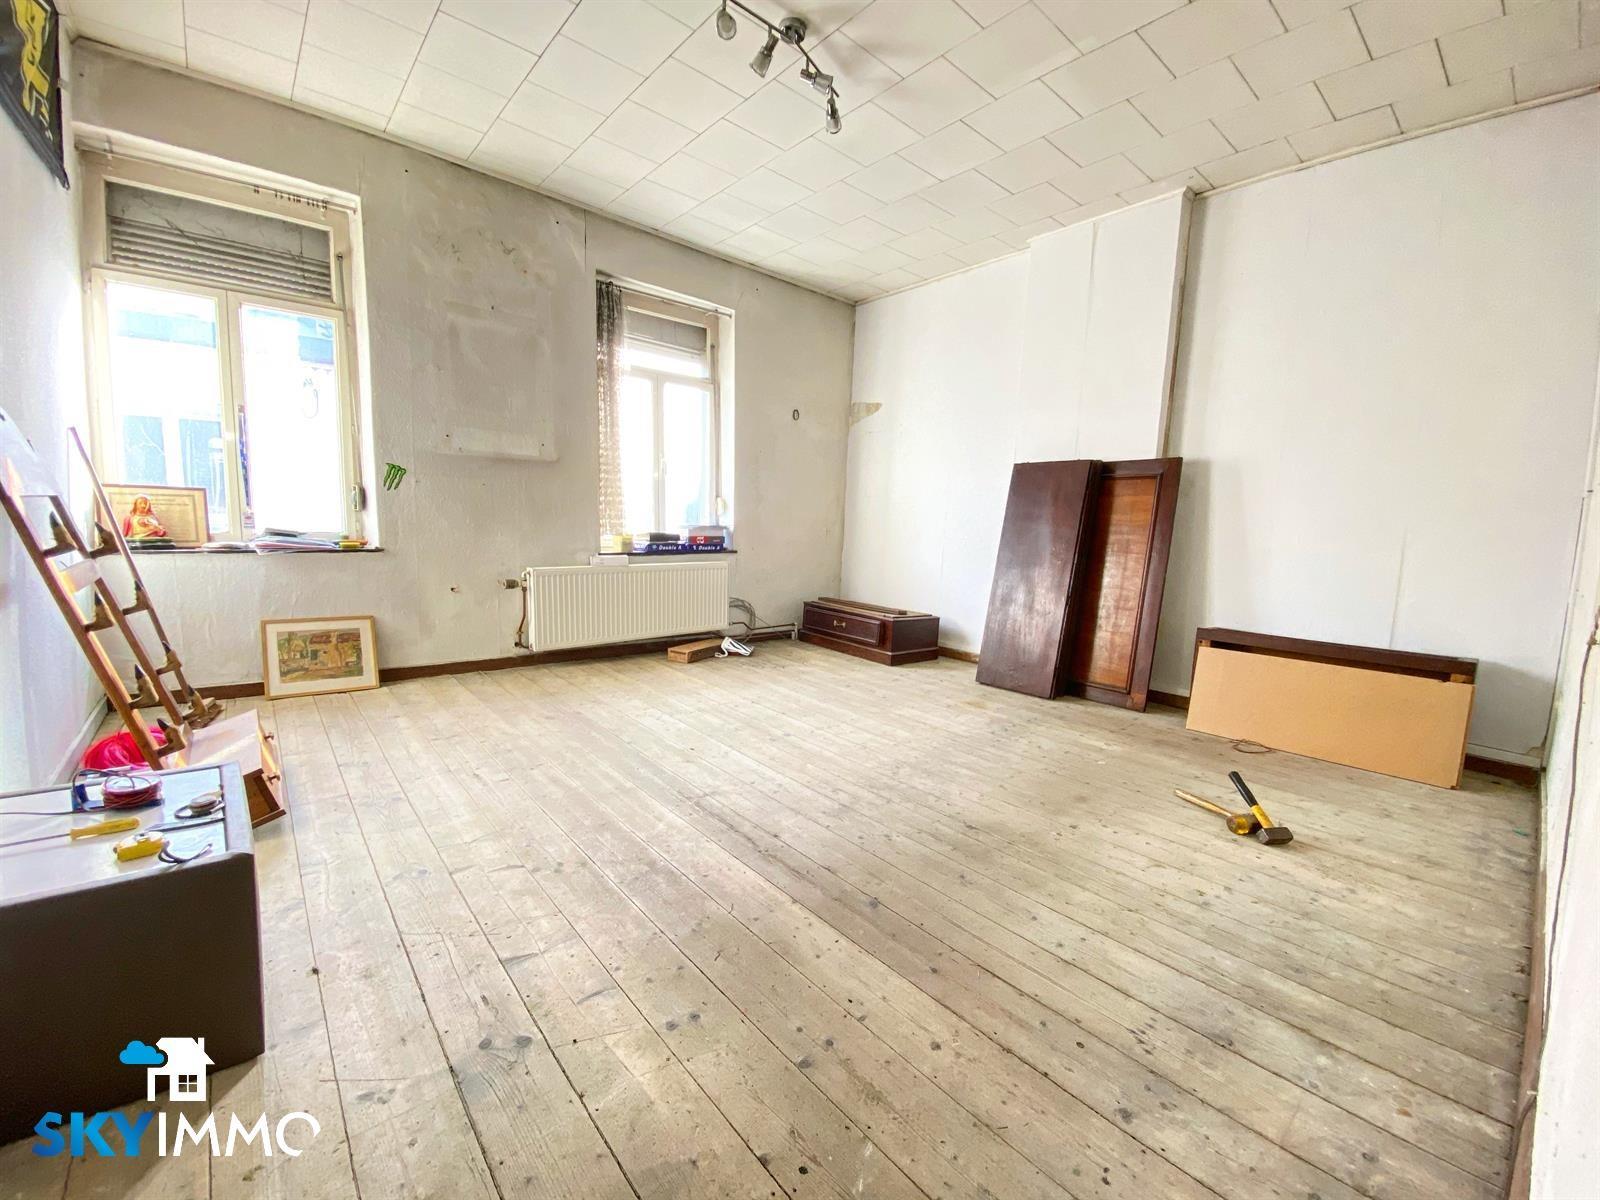 Maison - Saint-Nicolas - #4287983-25